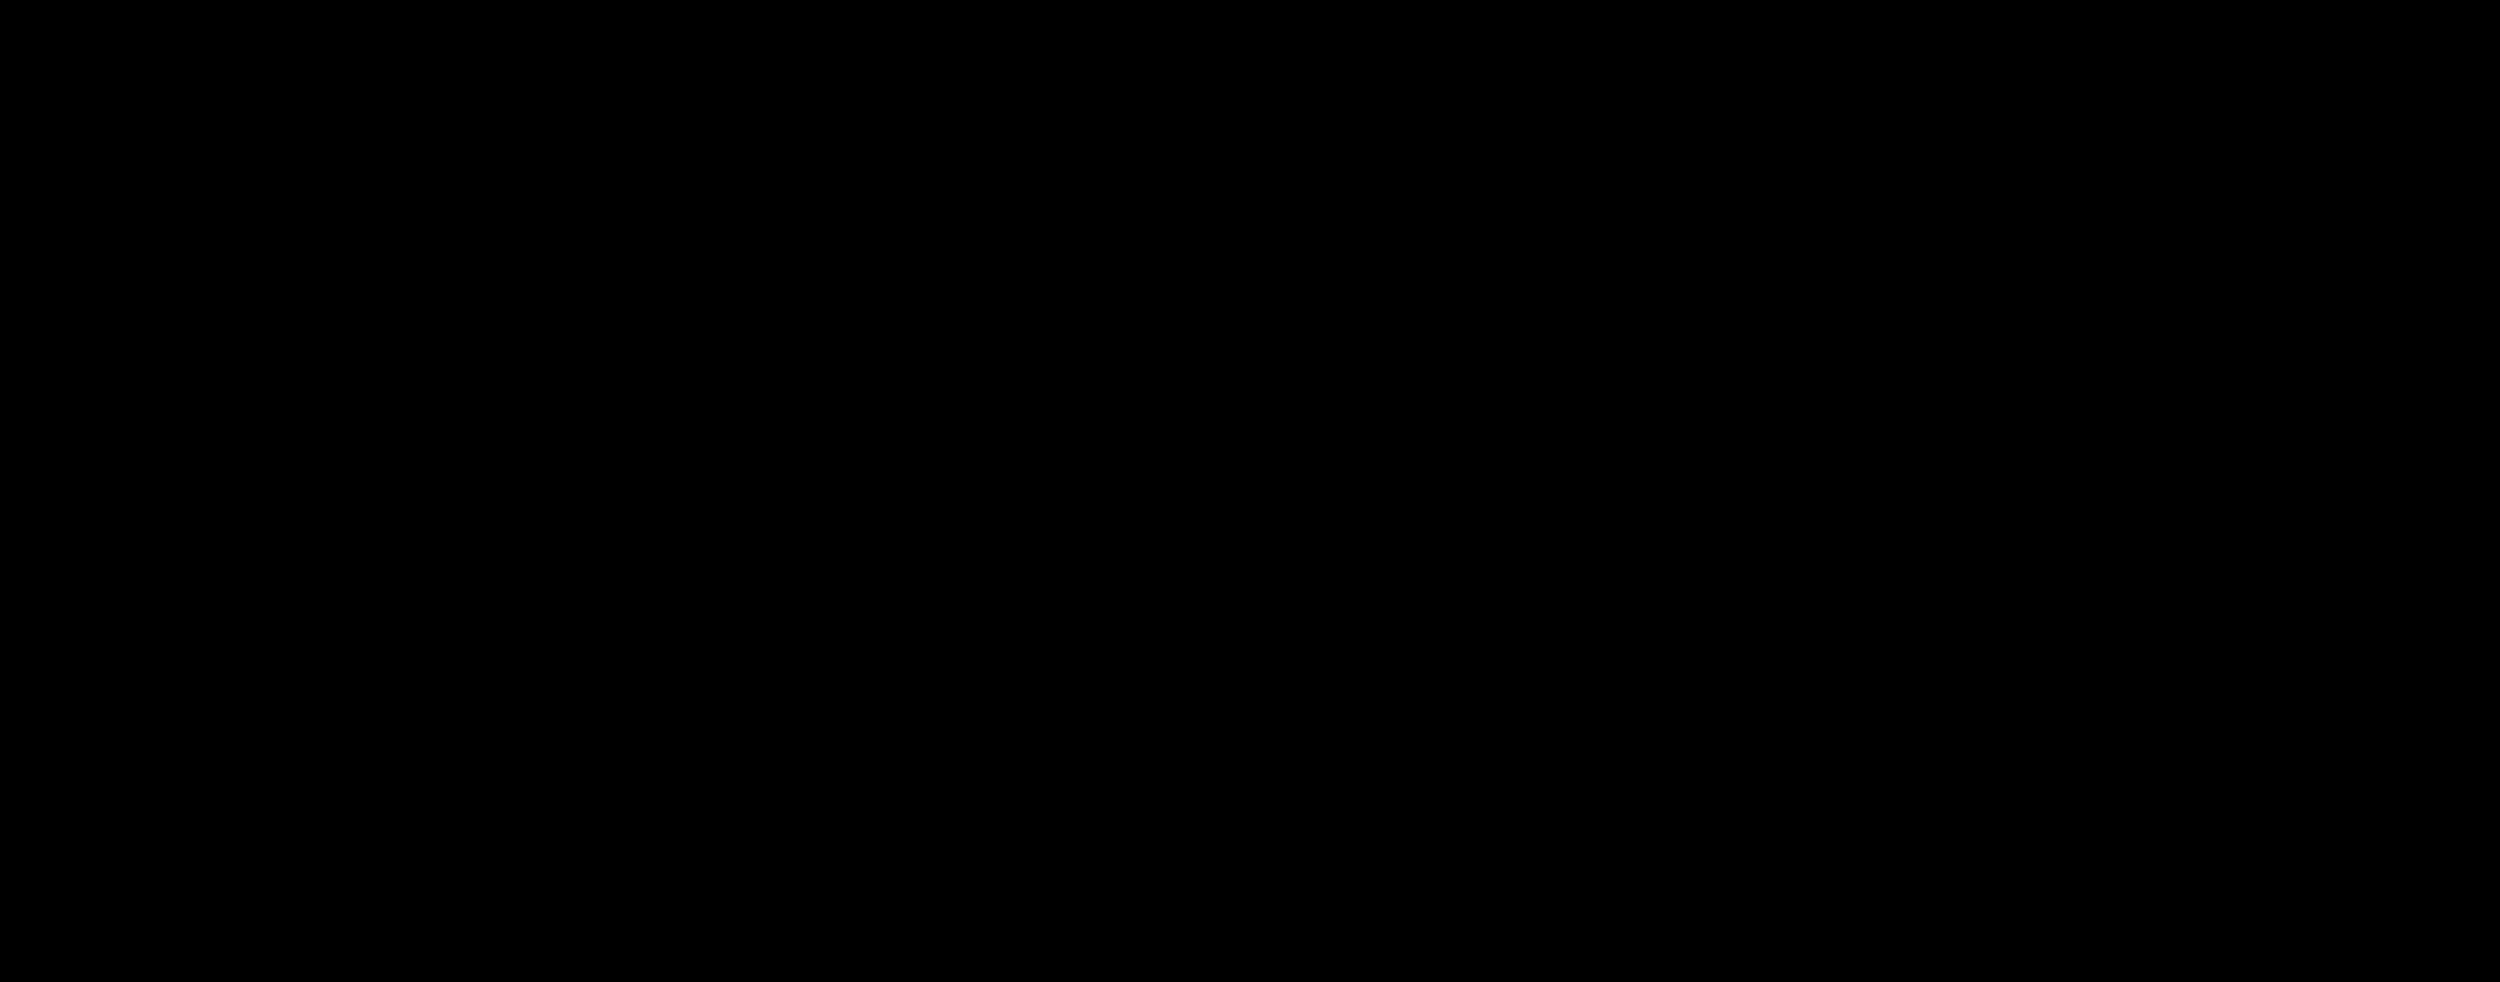 Obey_logo.png